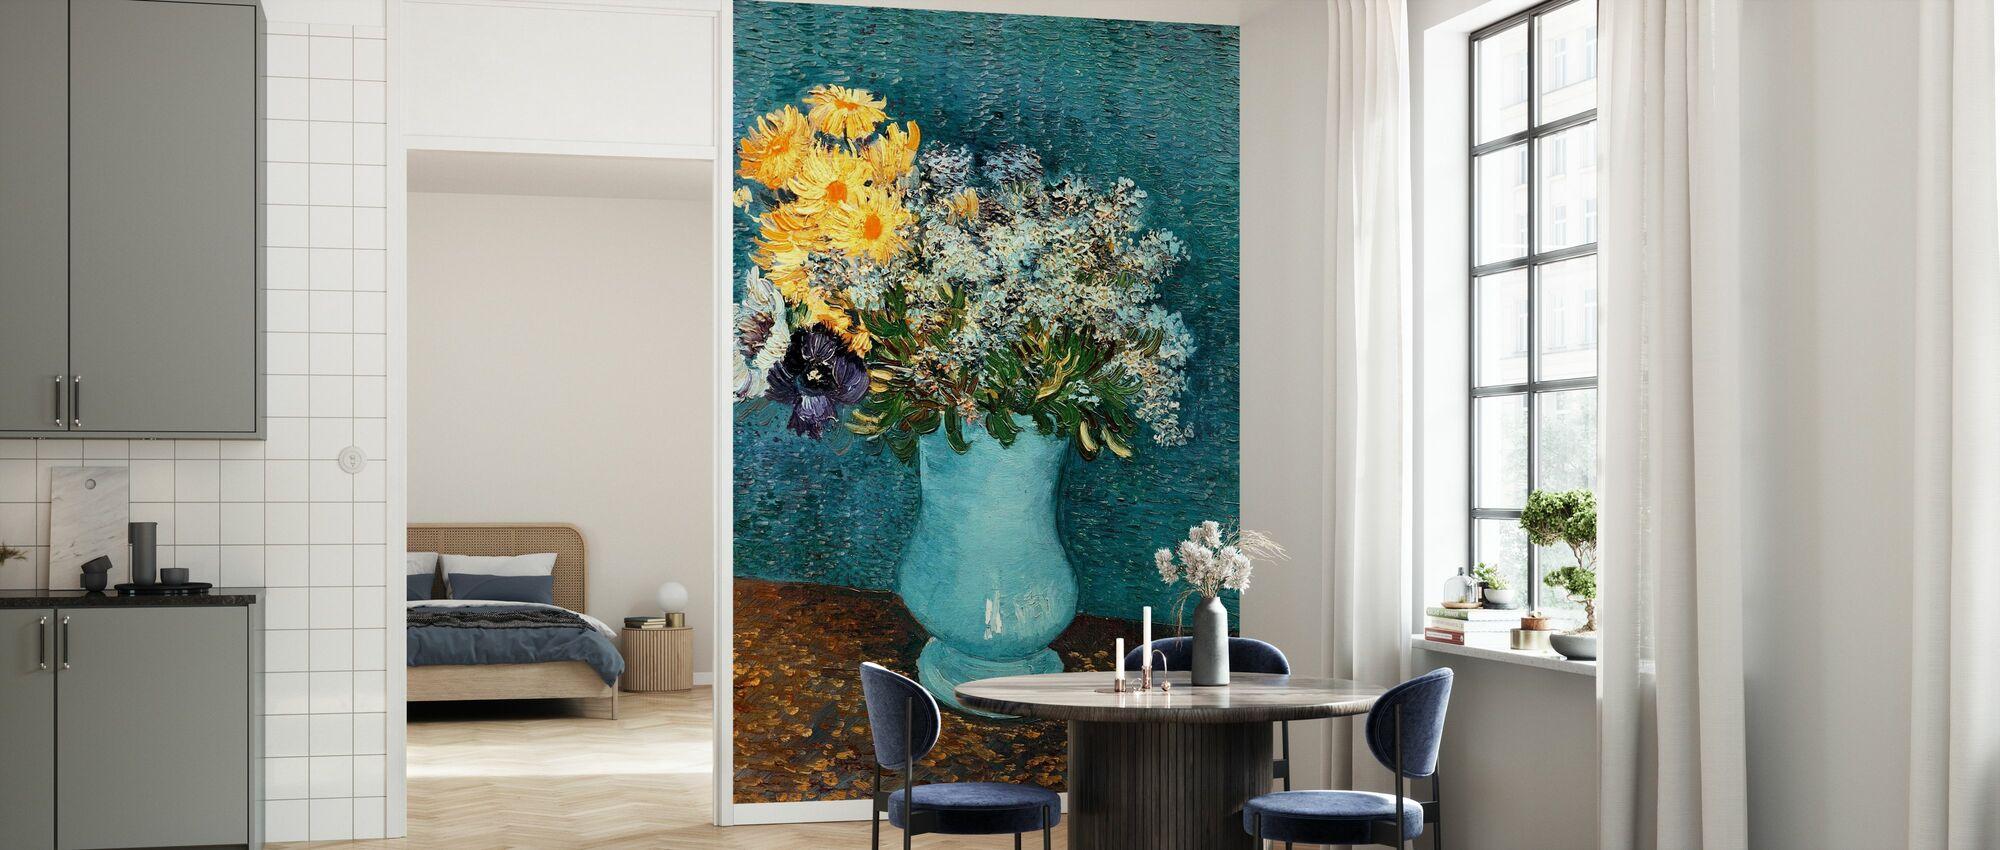 Vase med syriner, tusenfryd og Anemoner, Vincent van Gogh - Tapet - Kjøkken